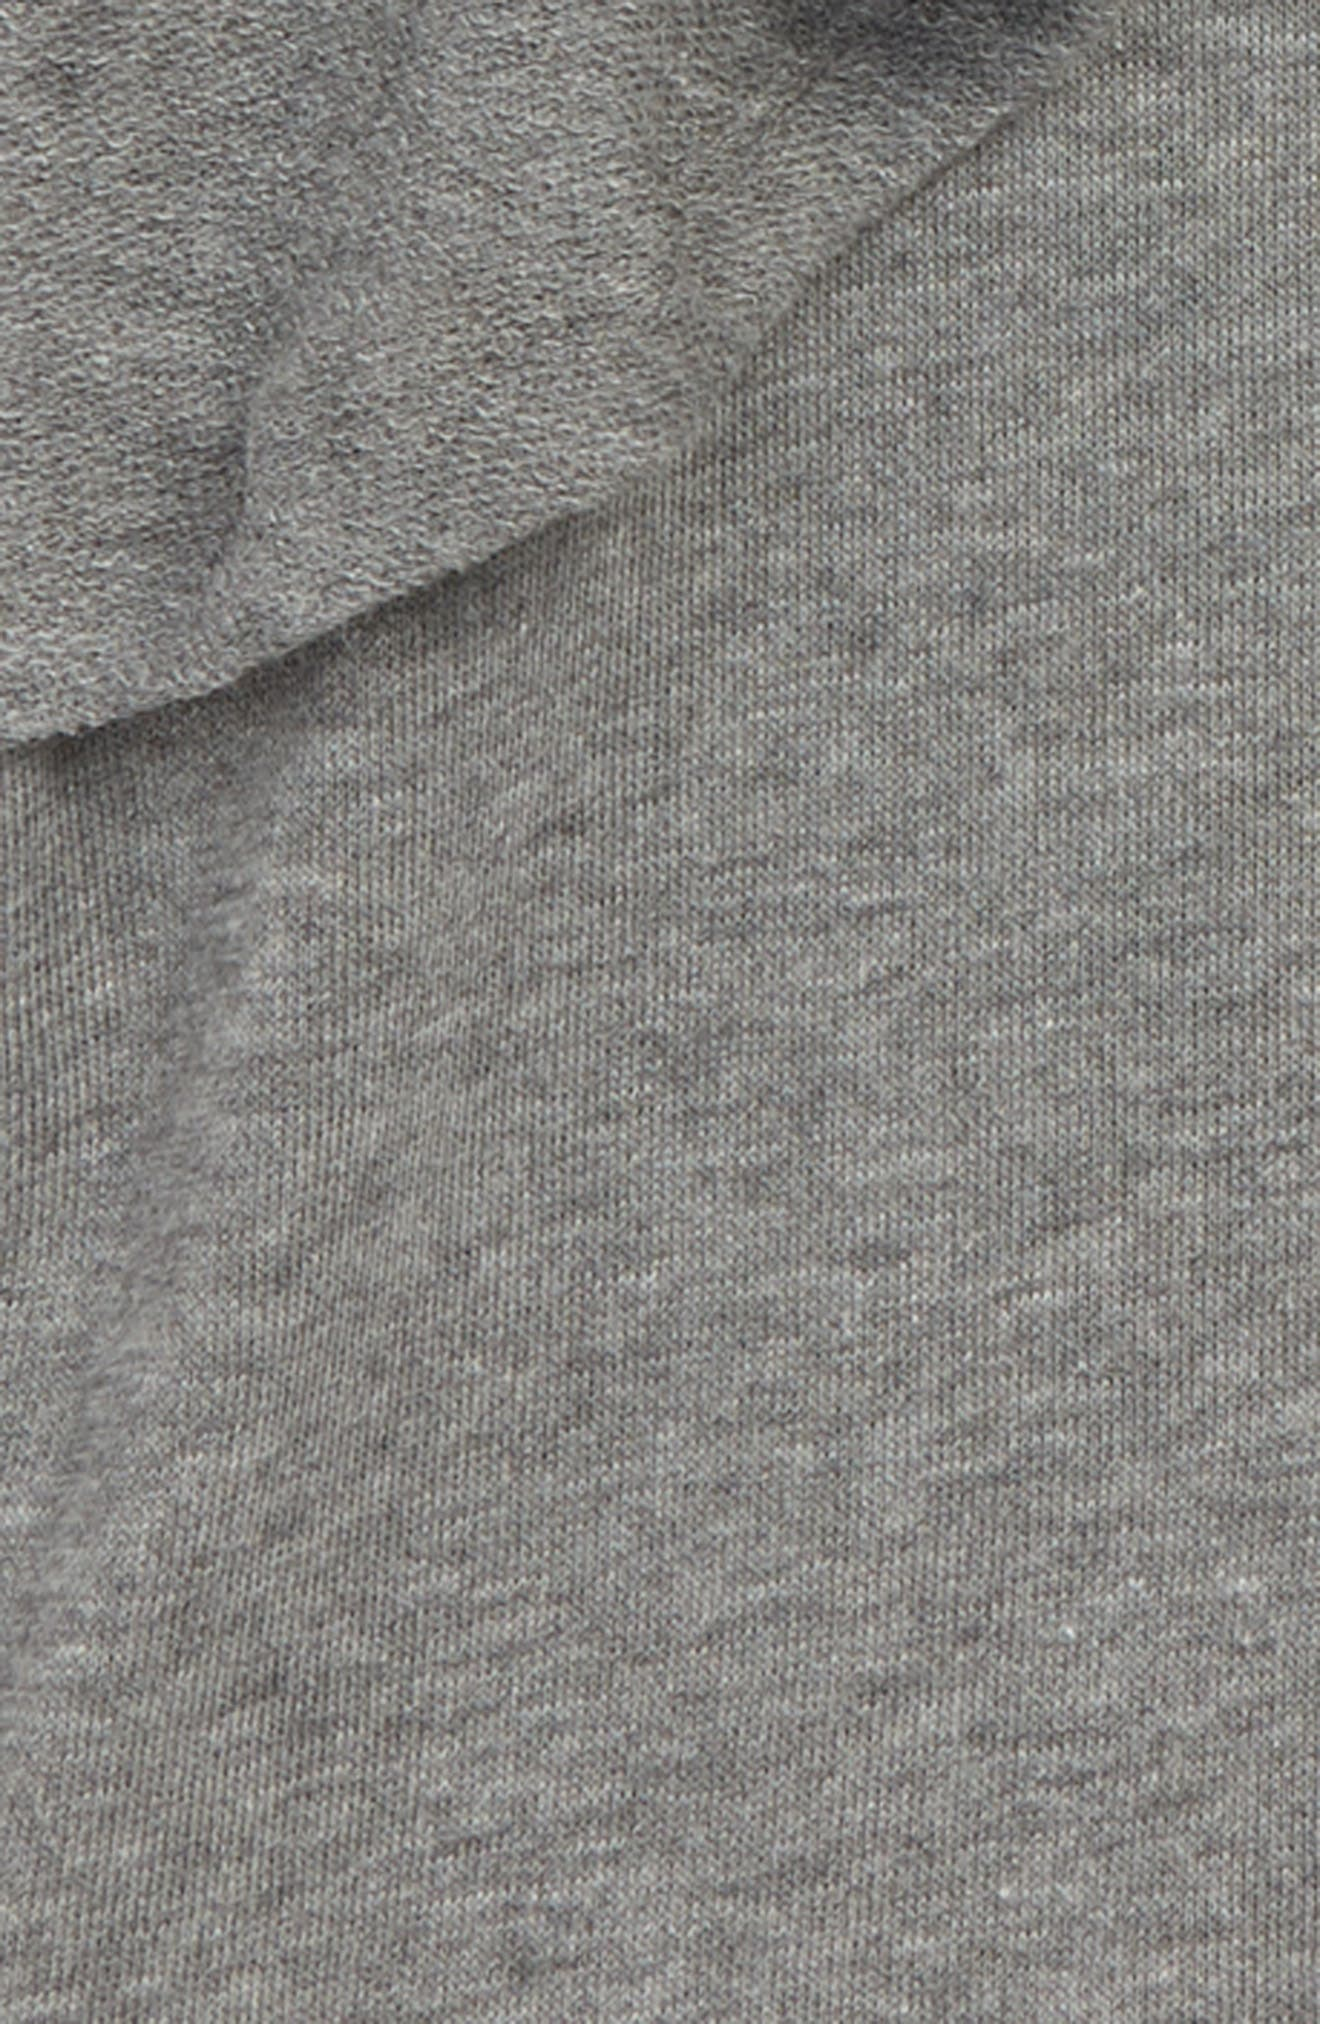 Ruffle Sweatshirt,                             Alternate thumbnail 2, color,                             020